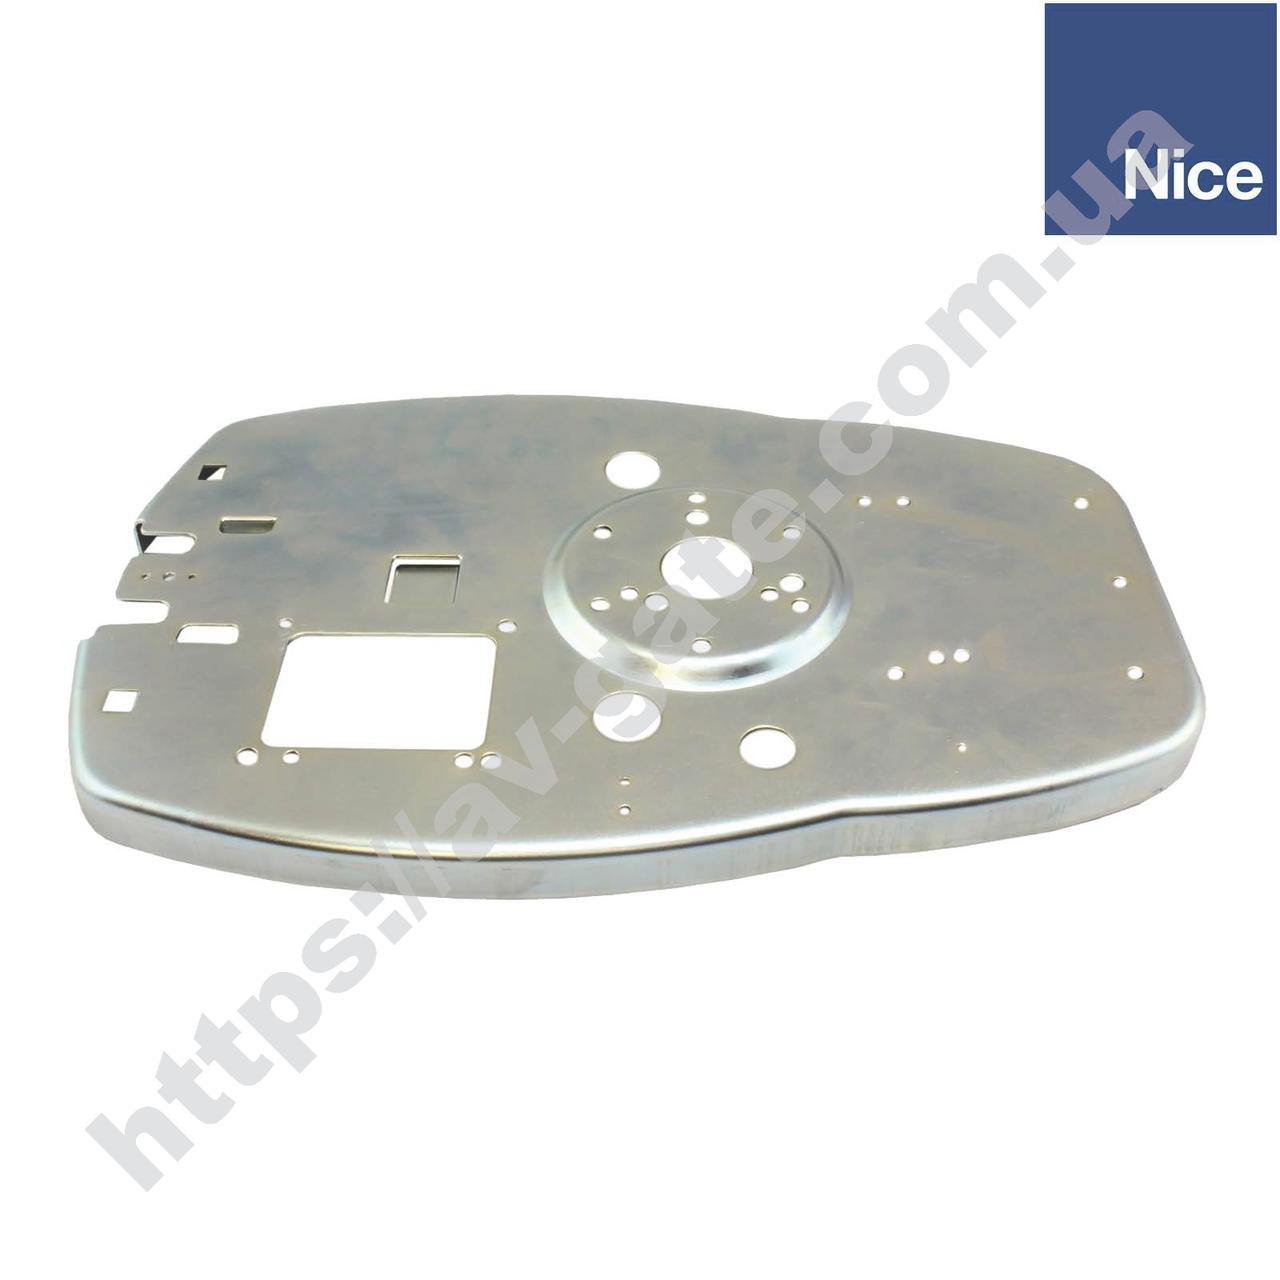 Основание привода SP6000 / SP6100 Nice PMD0122.4610